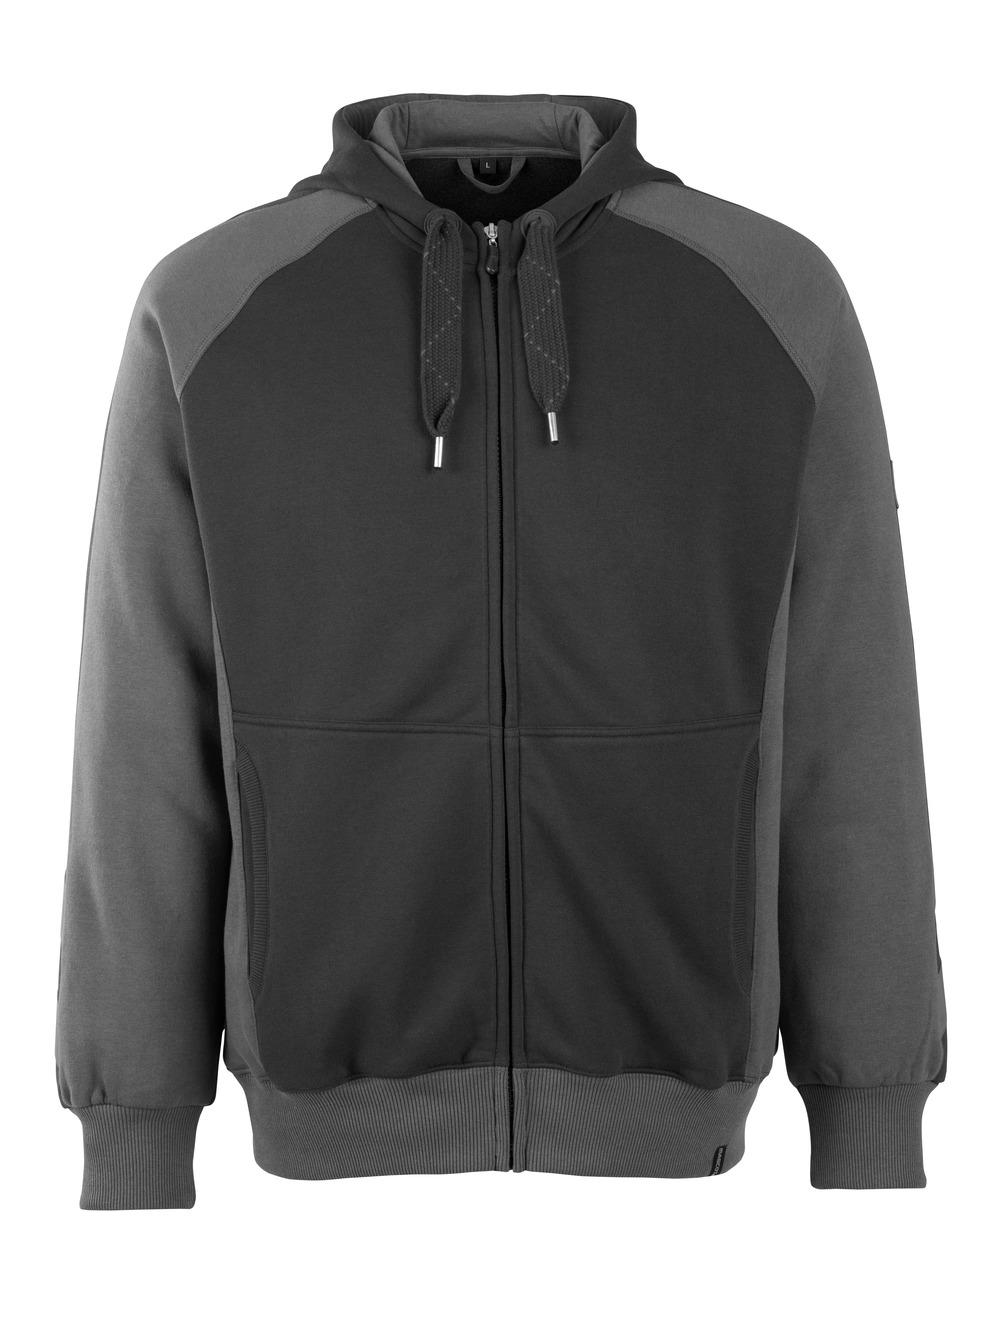 50566-963-0918 Hoodie with zipper - black/dark anthracite